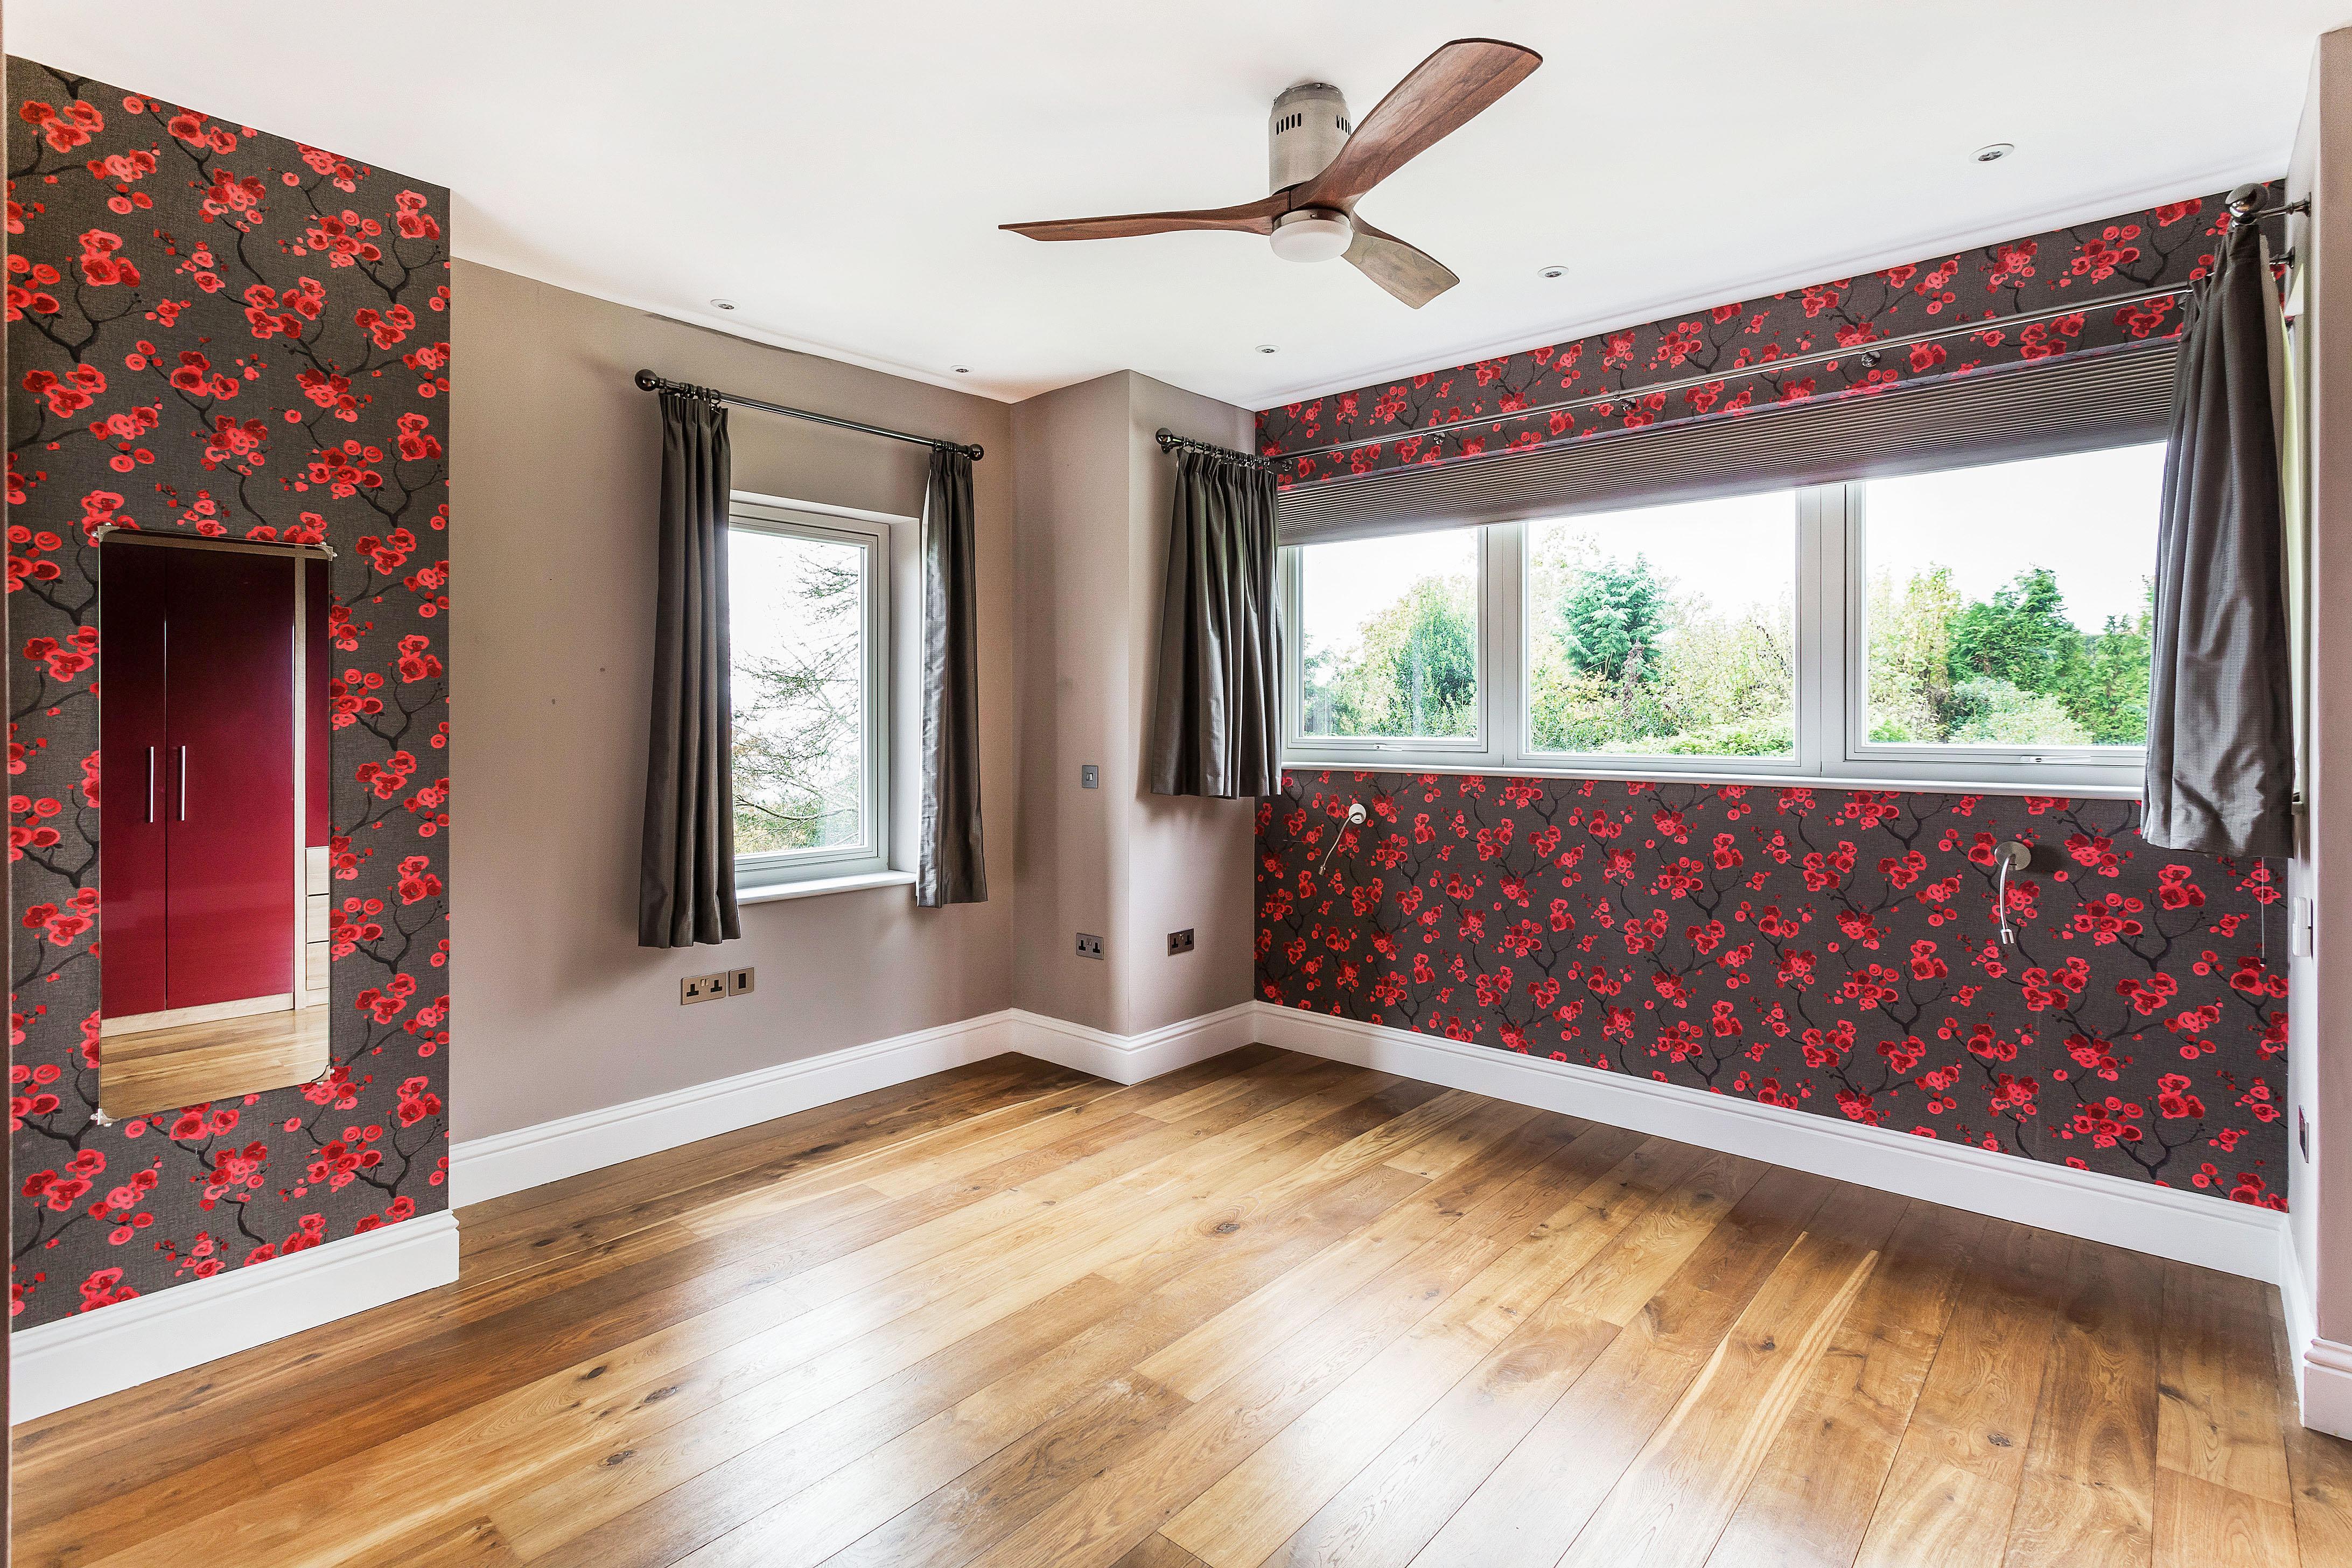 heat recovery,Master Bedroom